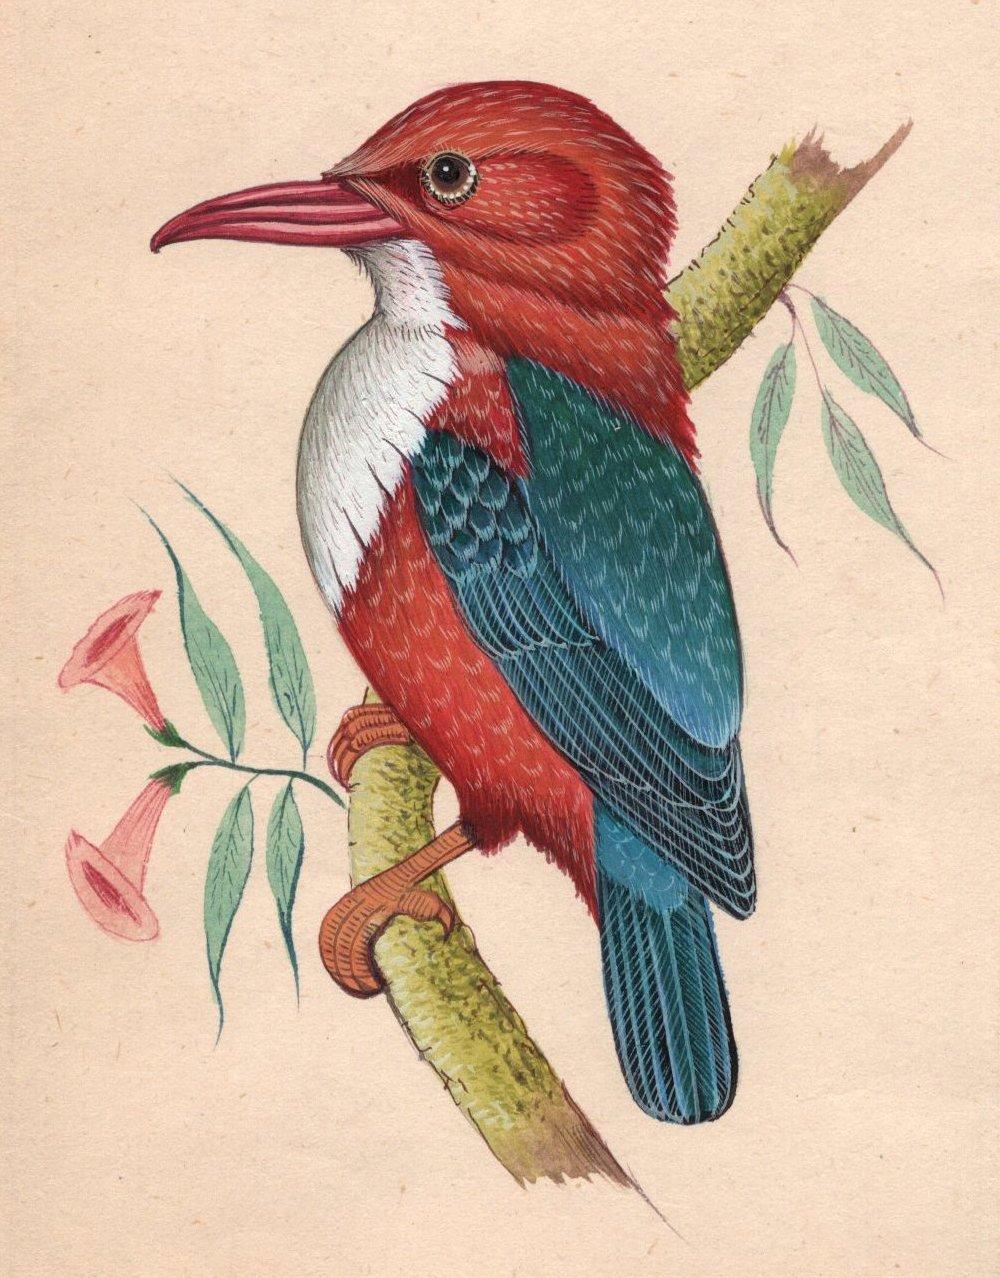 Kingfisher Bird Miniature Painting Hand Painted Indian Nature Ornithology Art